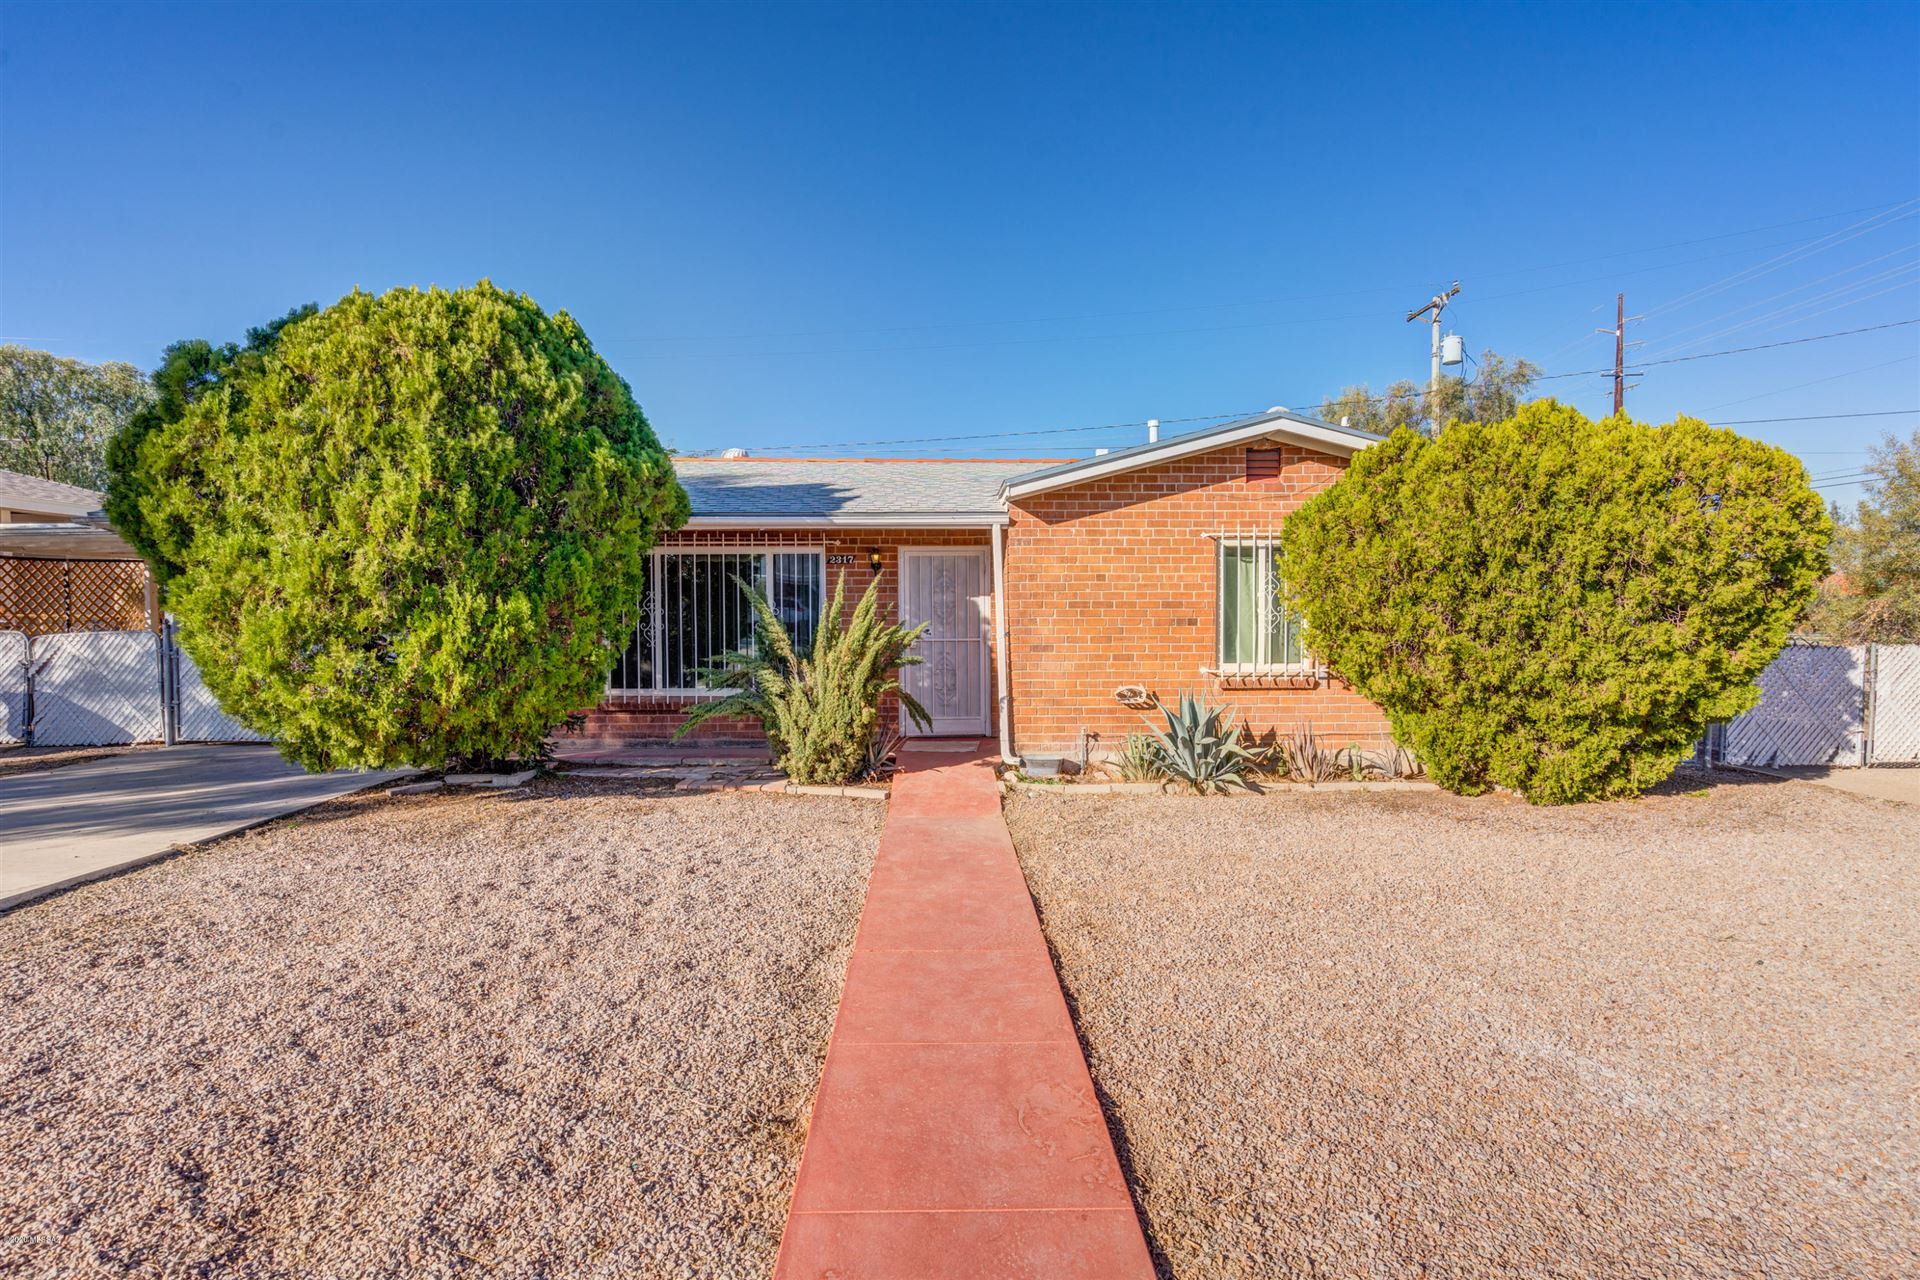 2317 N Avenida El Capitan, Tucson, AZ 85705 - MLS#: 22030367